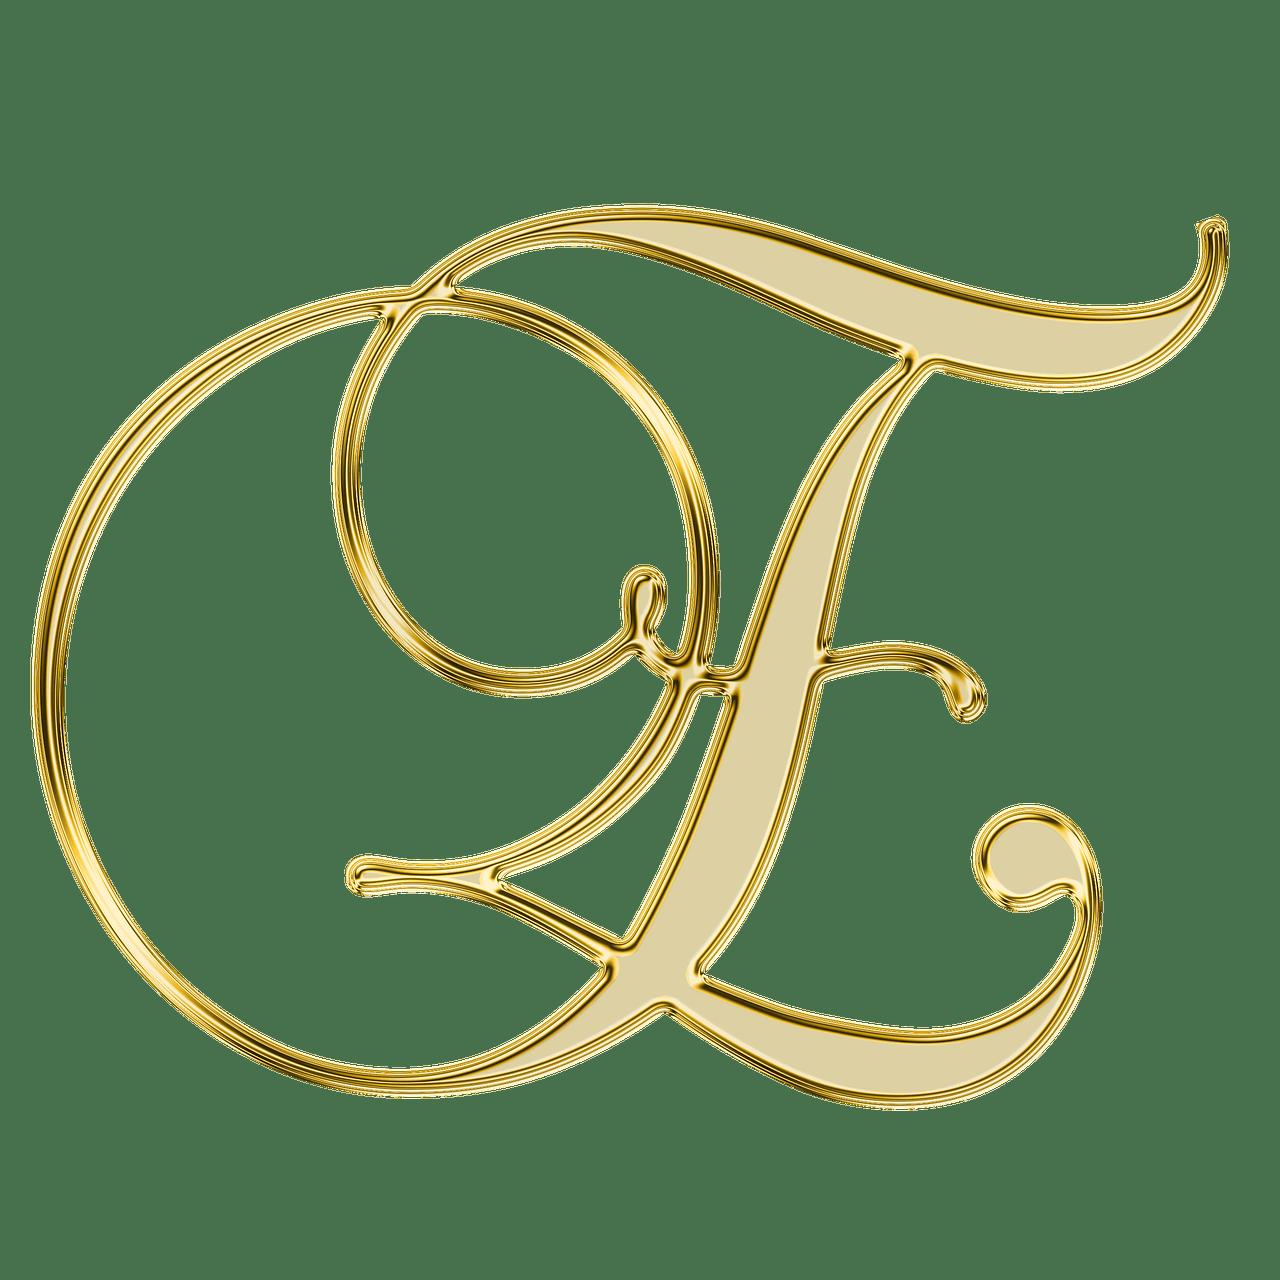 E clipart yellow letter. Capital elegant transparent png